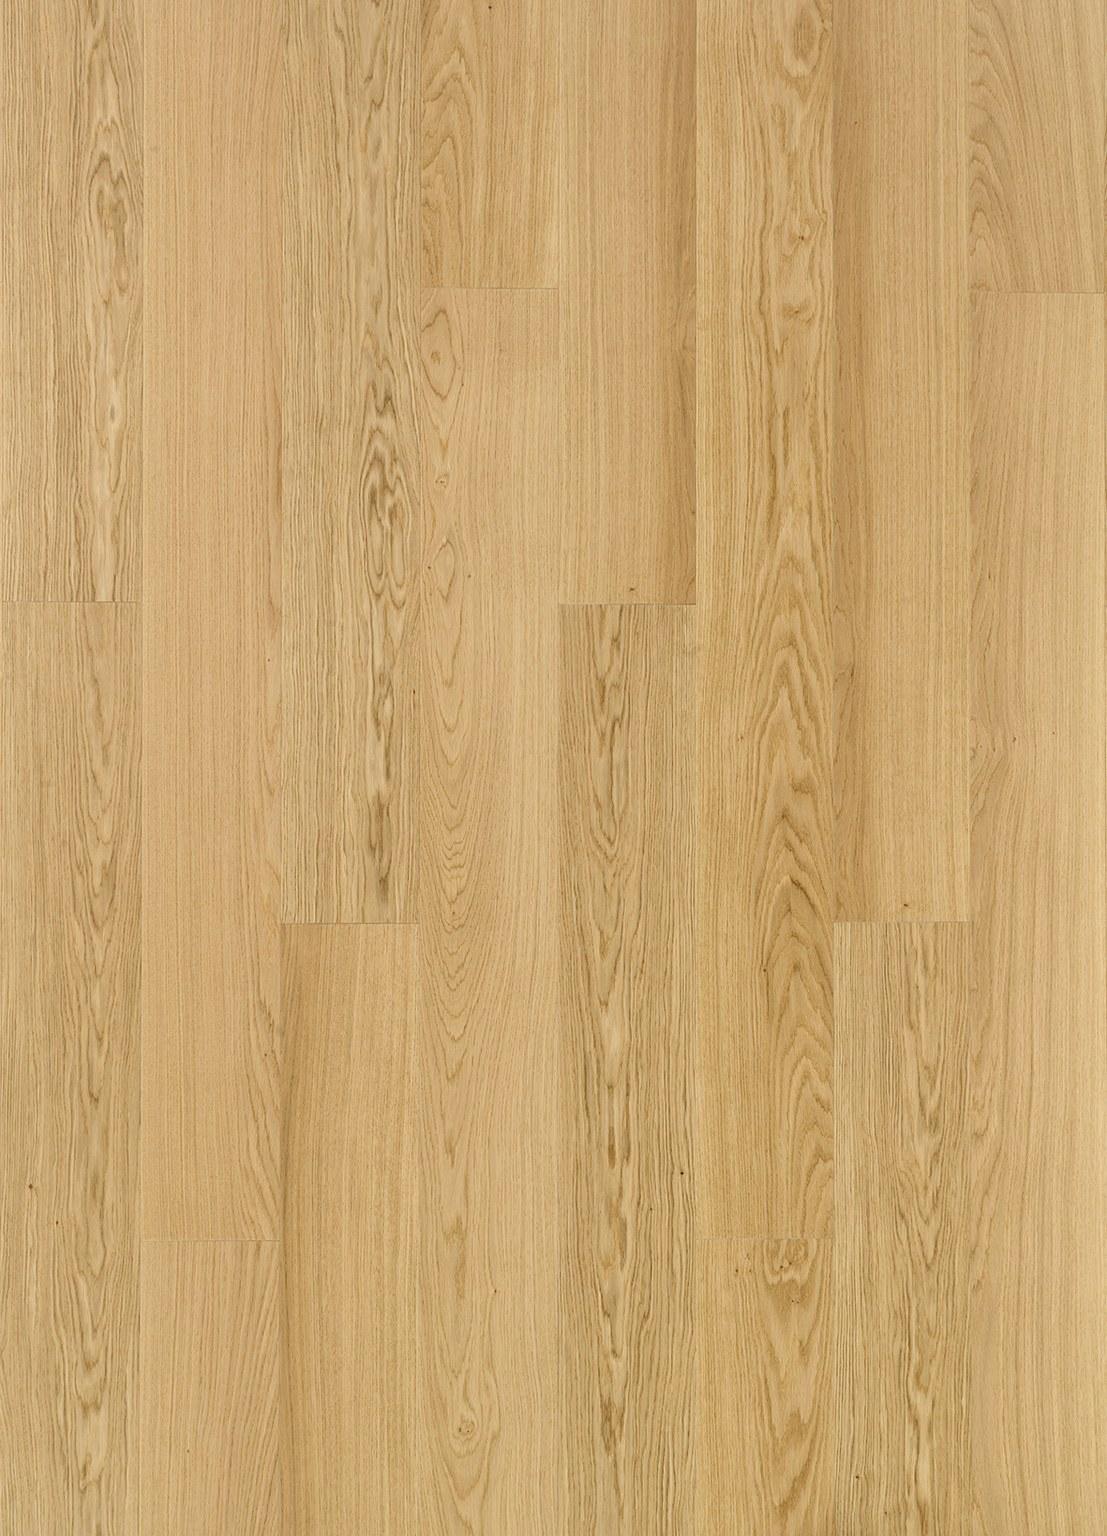 Timberwise Parketti Lankkuparketti Puulattia Wooden Floor Parquet Plank Tammi Oak Select Öljyvahattu Wax Oiled 2D1